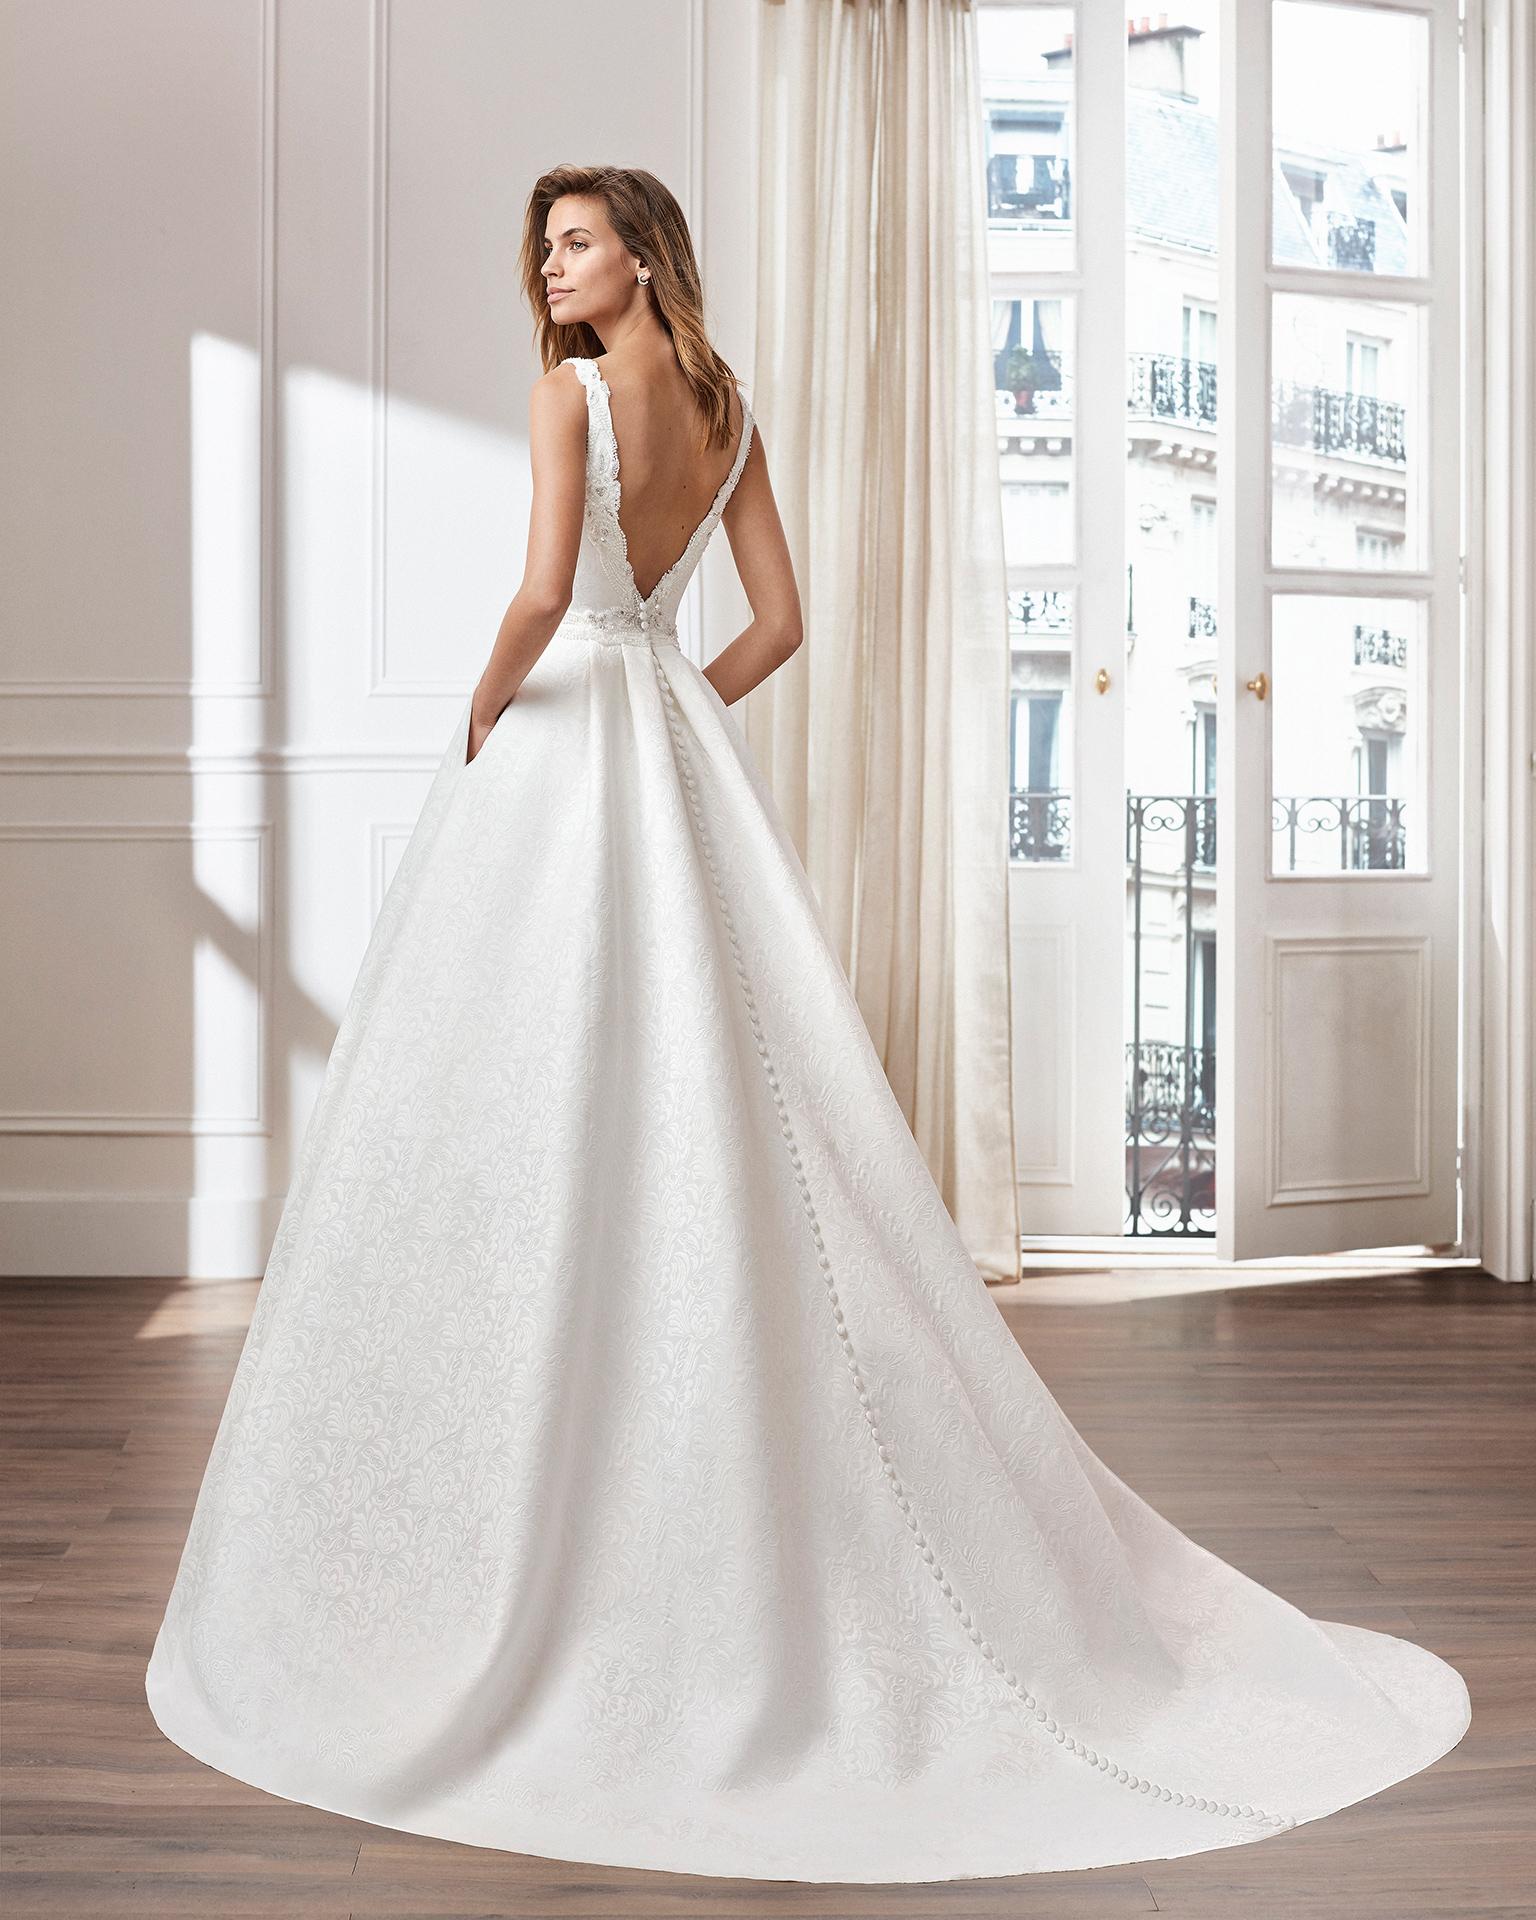 Robe de mariée chic - VOZ